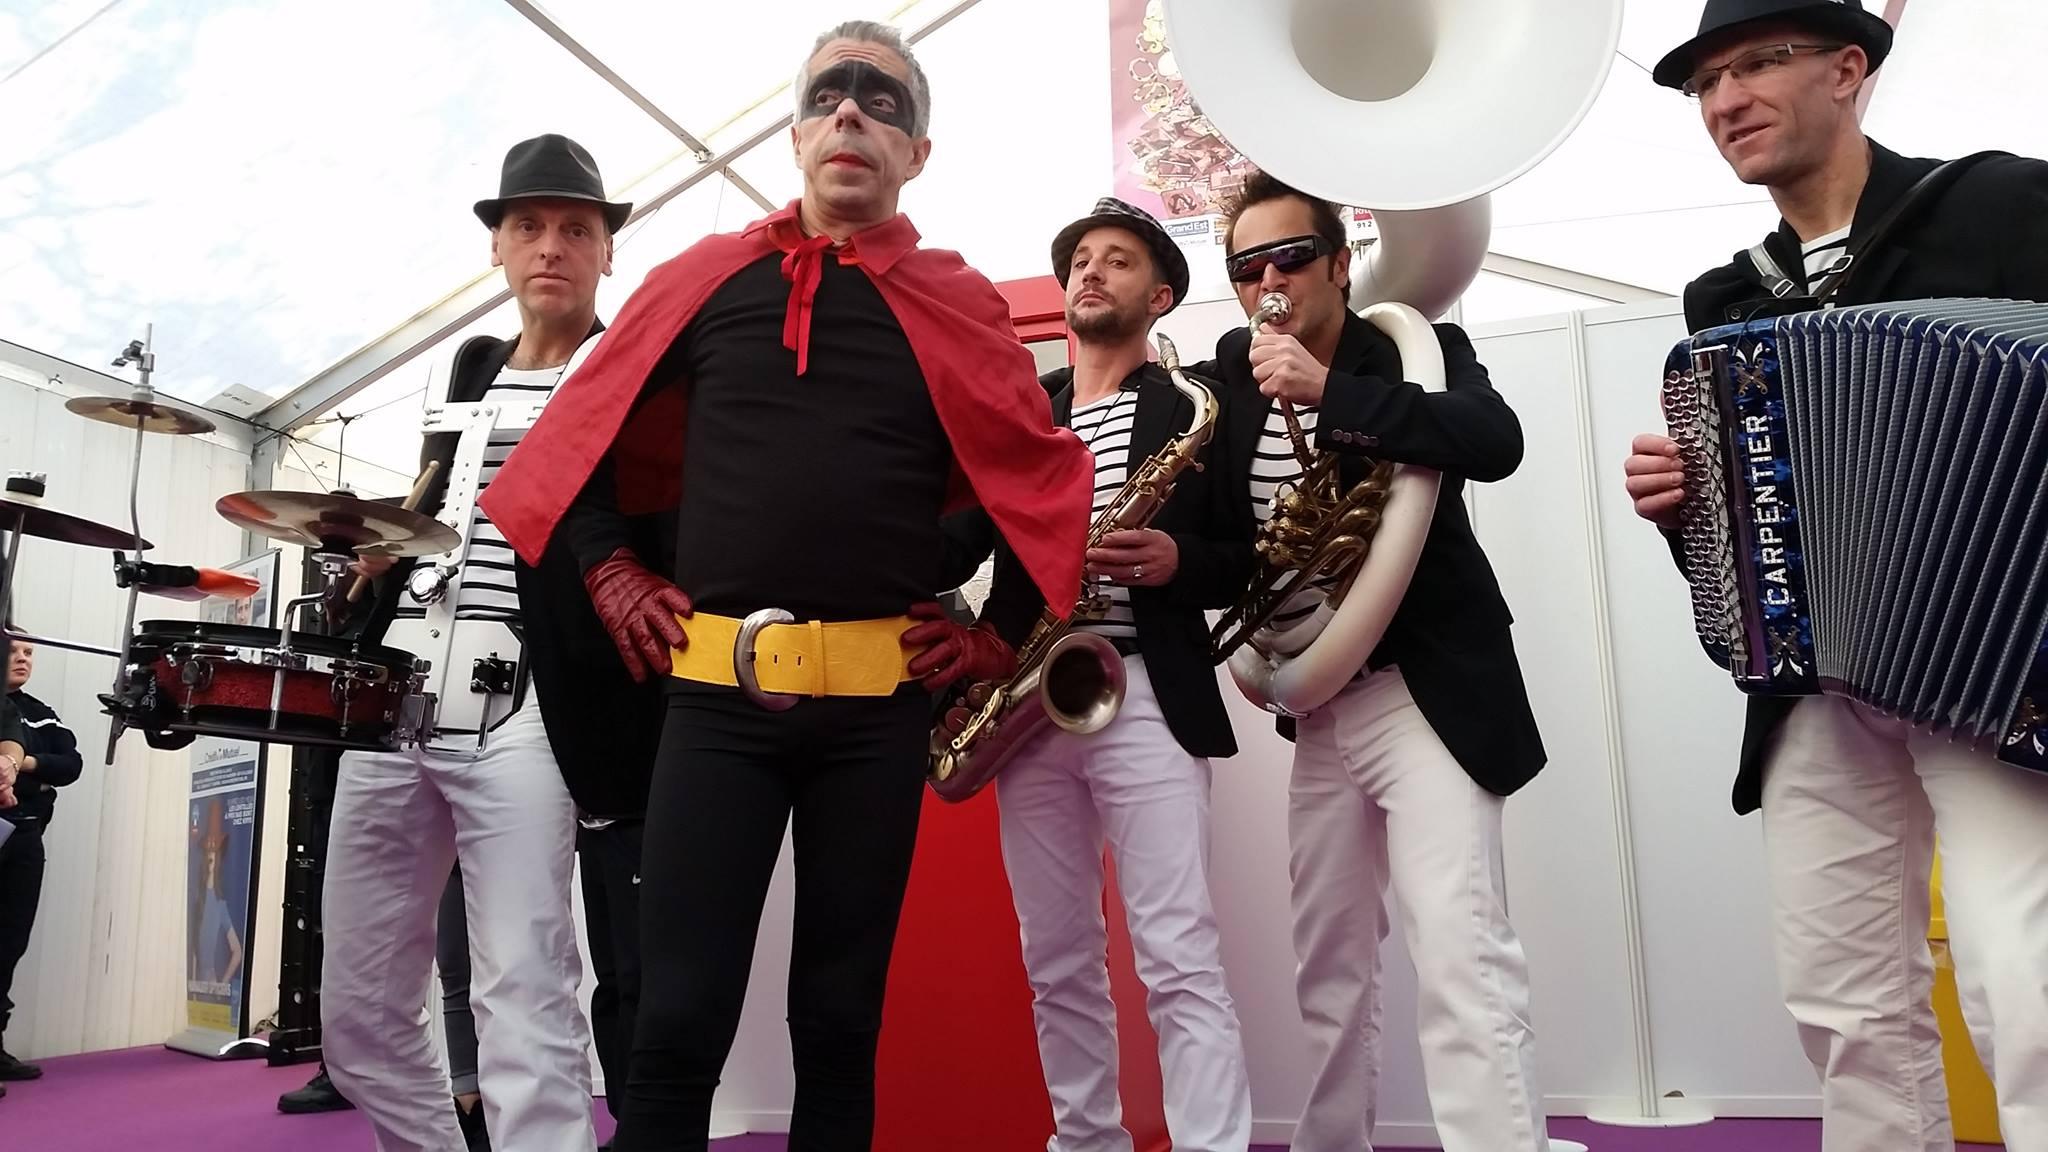 Festival Bédéciné de Ilzach